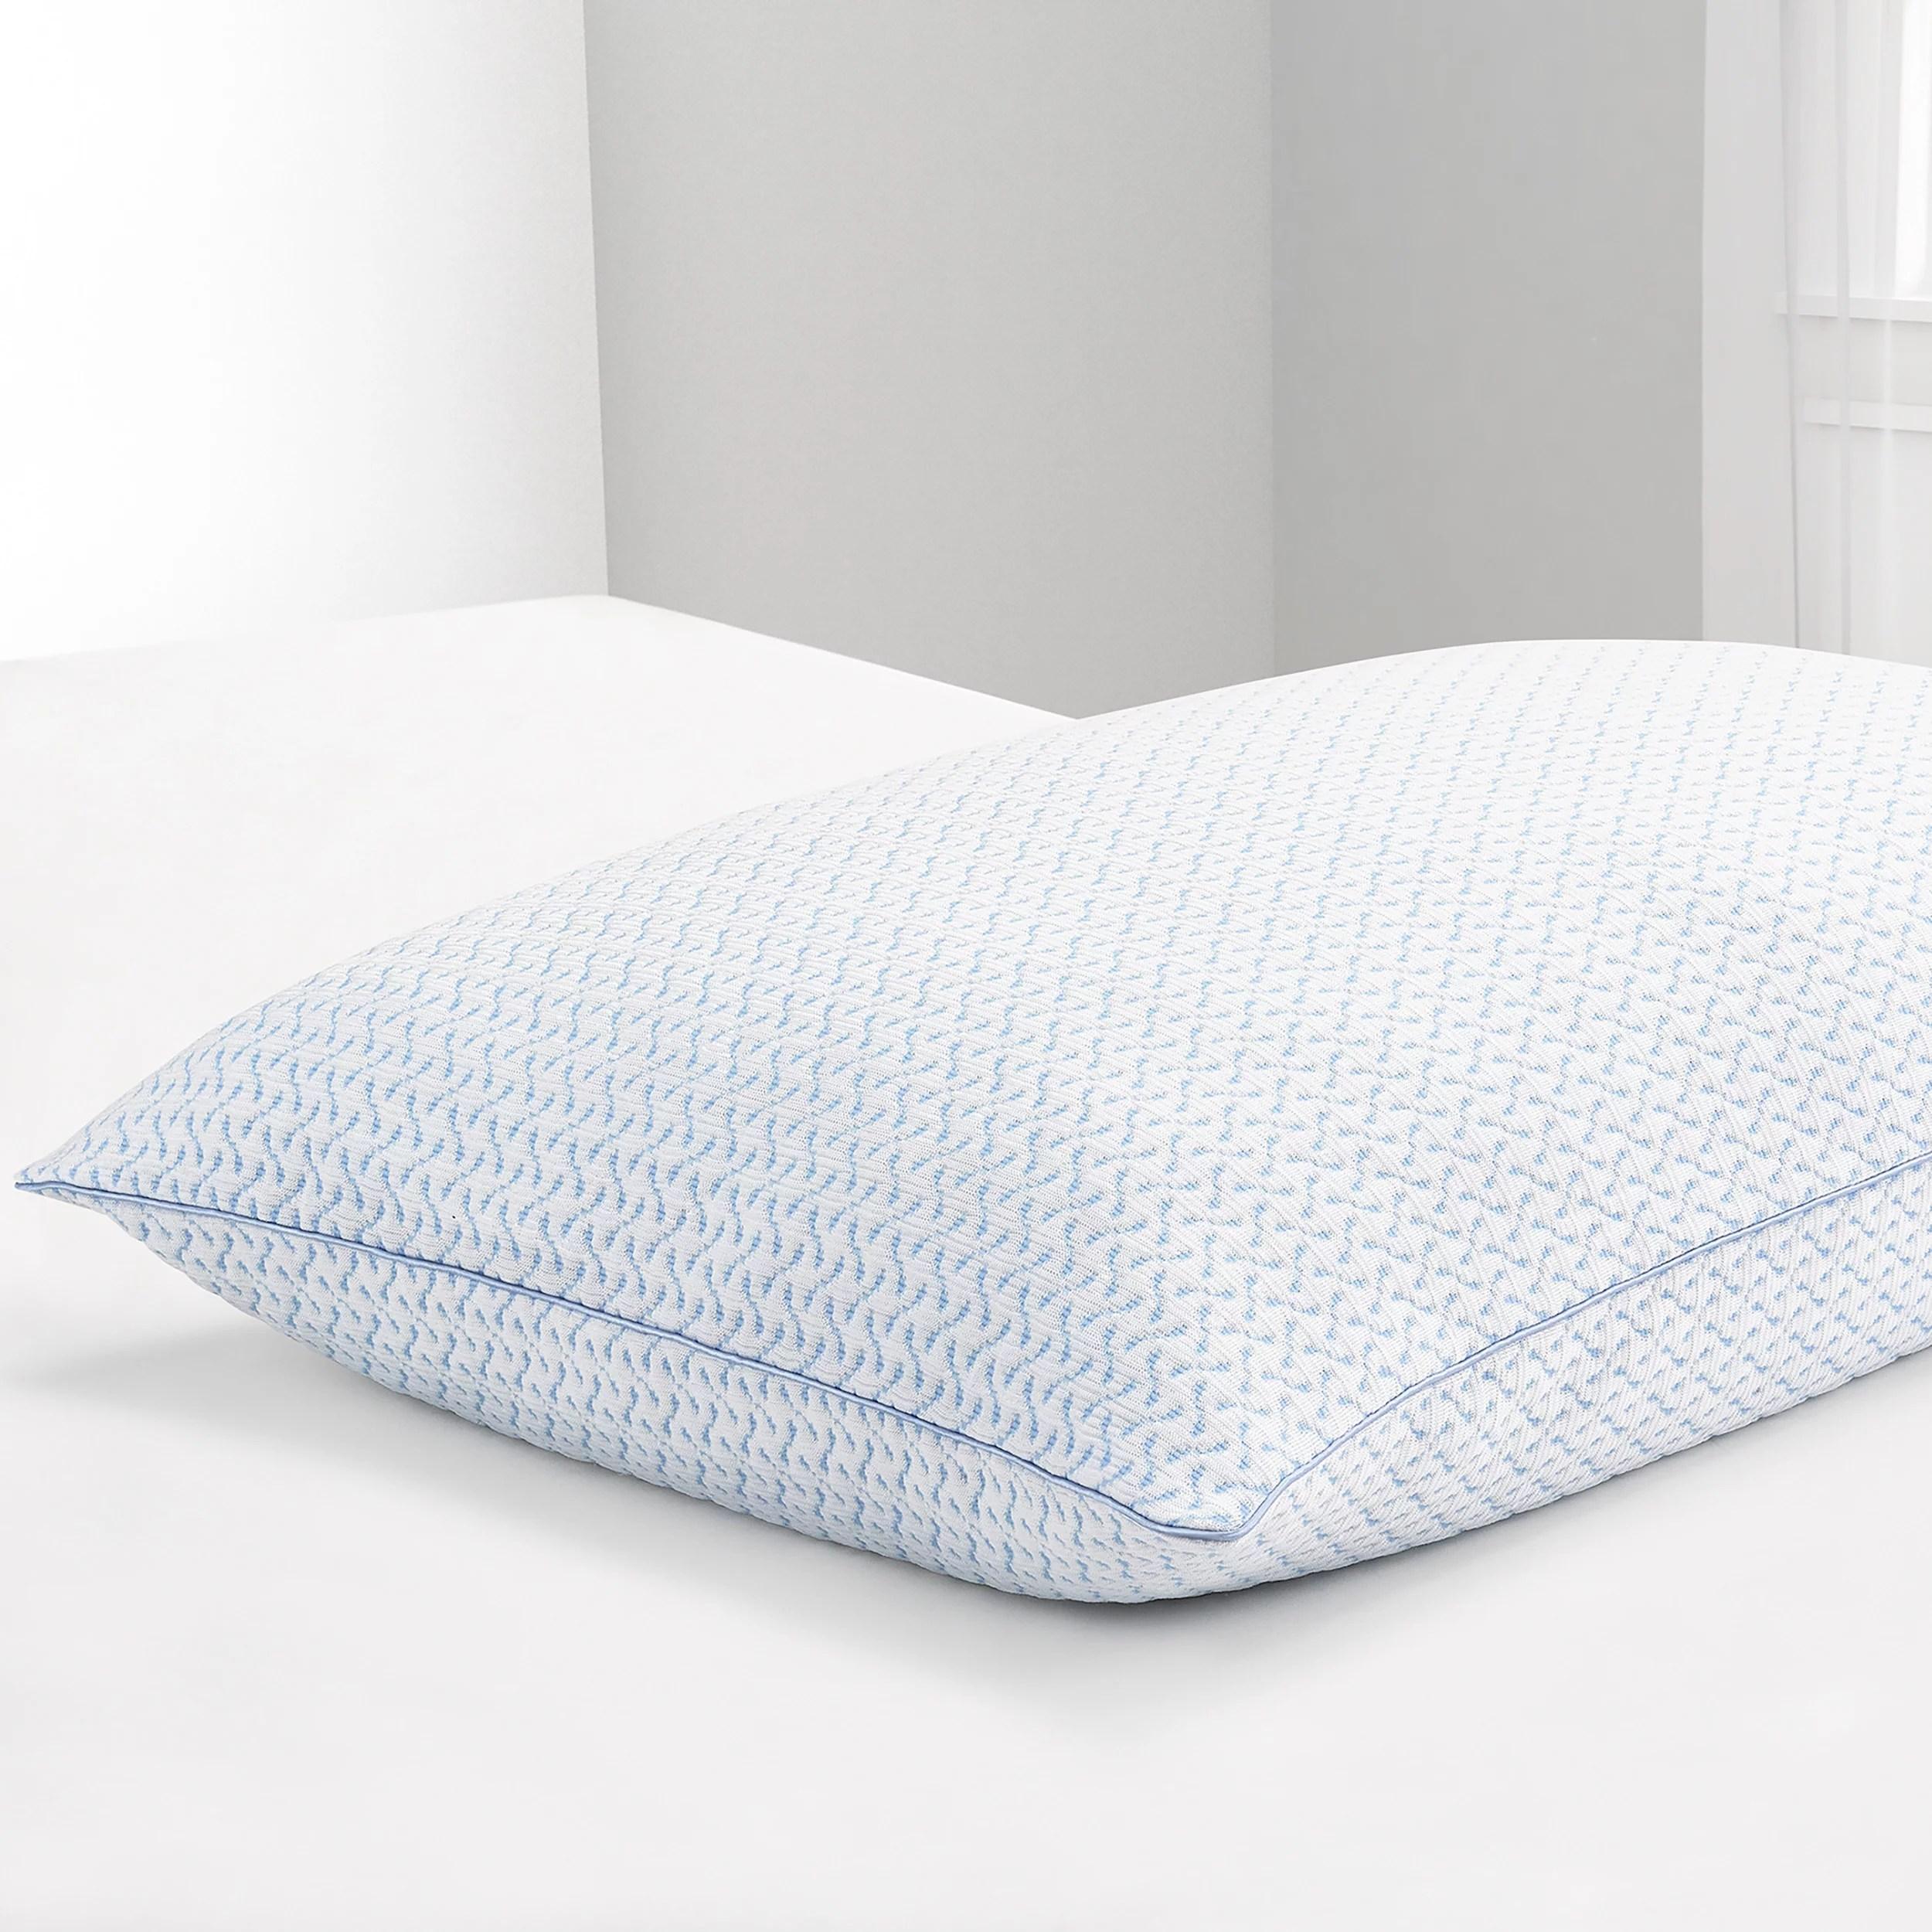 beautyrest silver sensacool shapeable memory foam cluster pillow